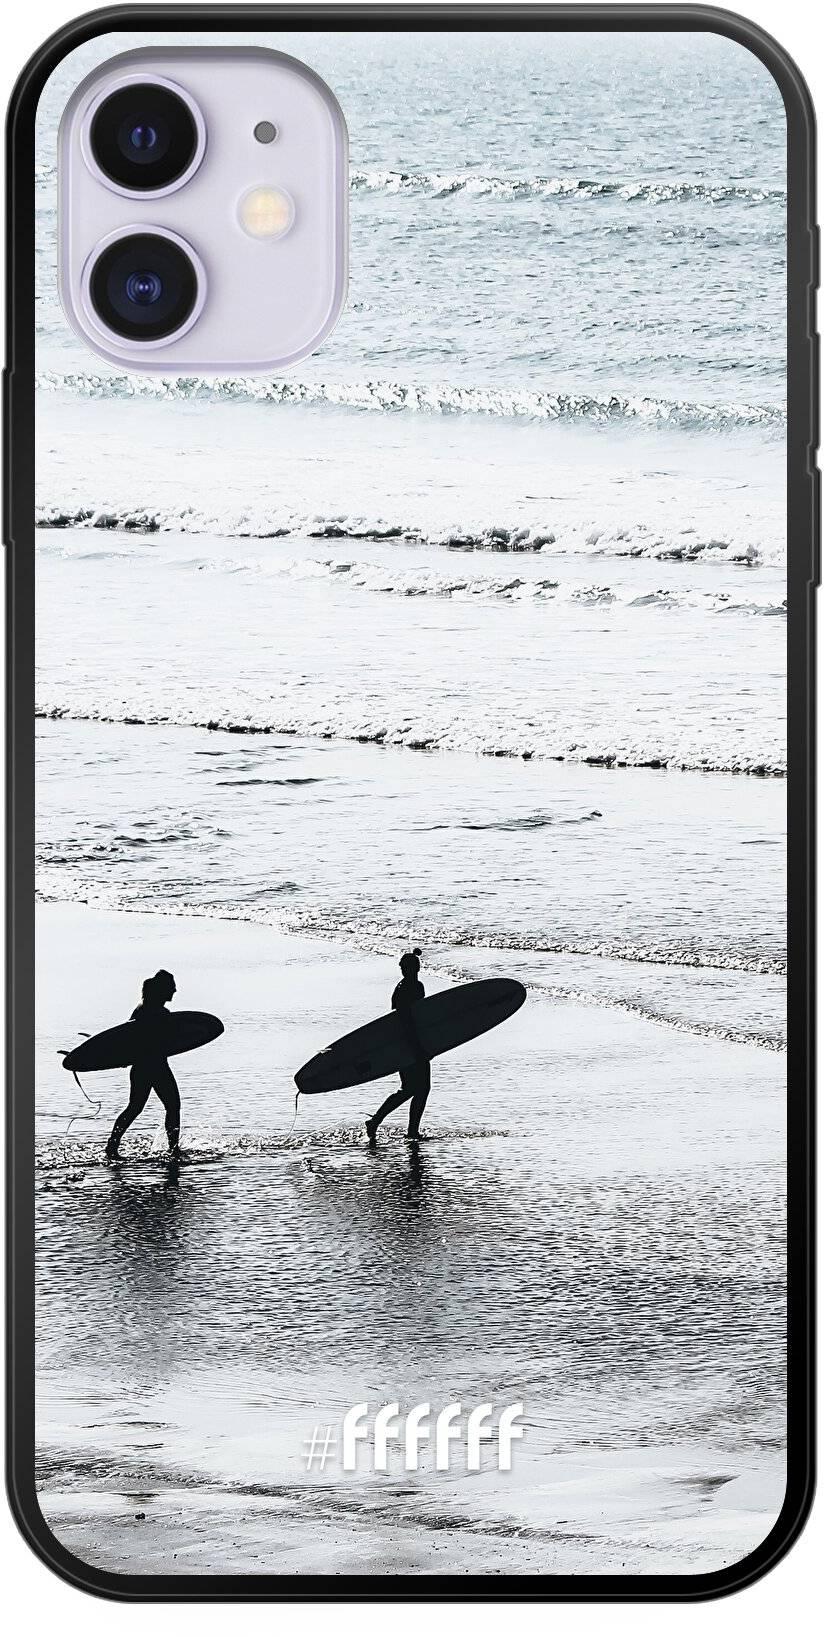 Surfing iPhone 11